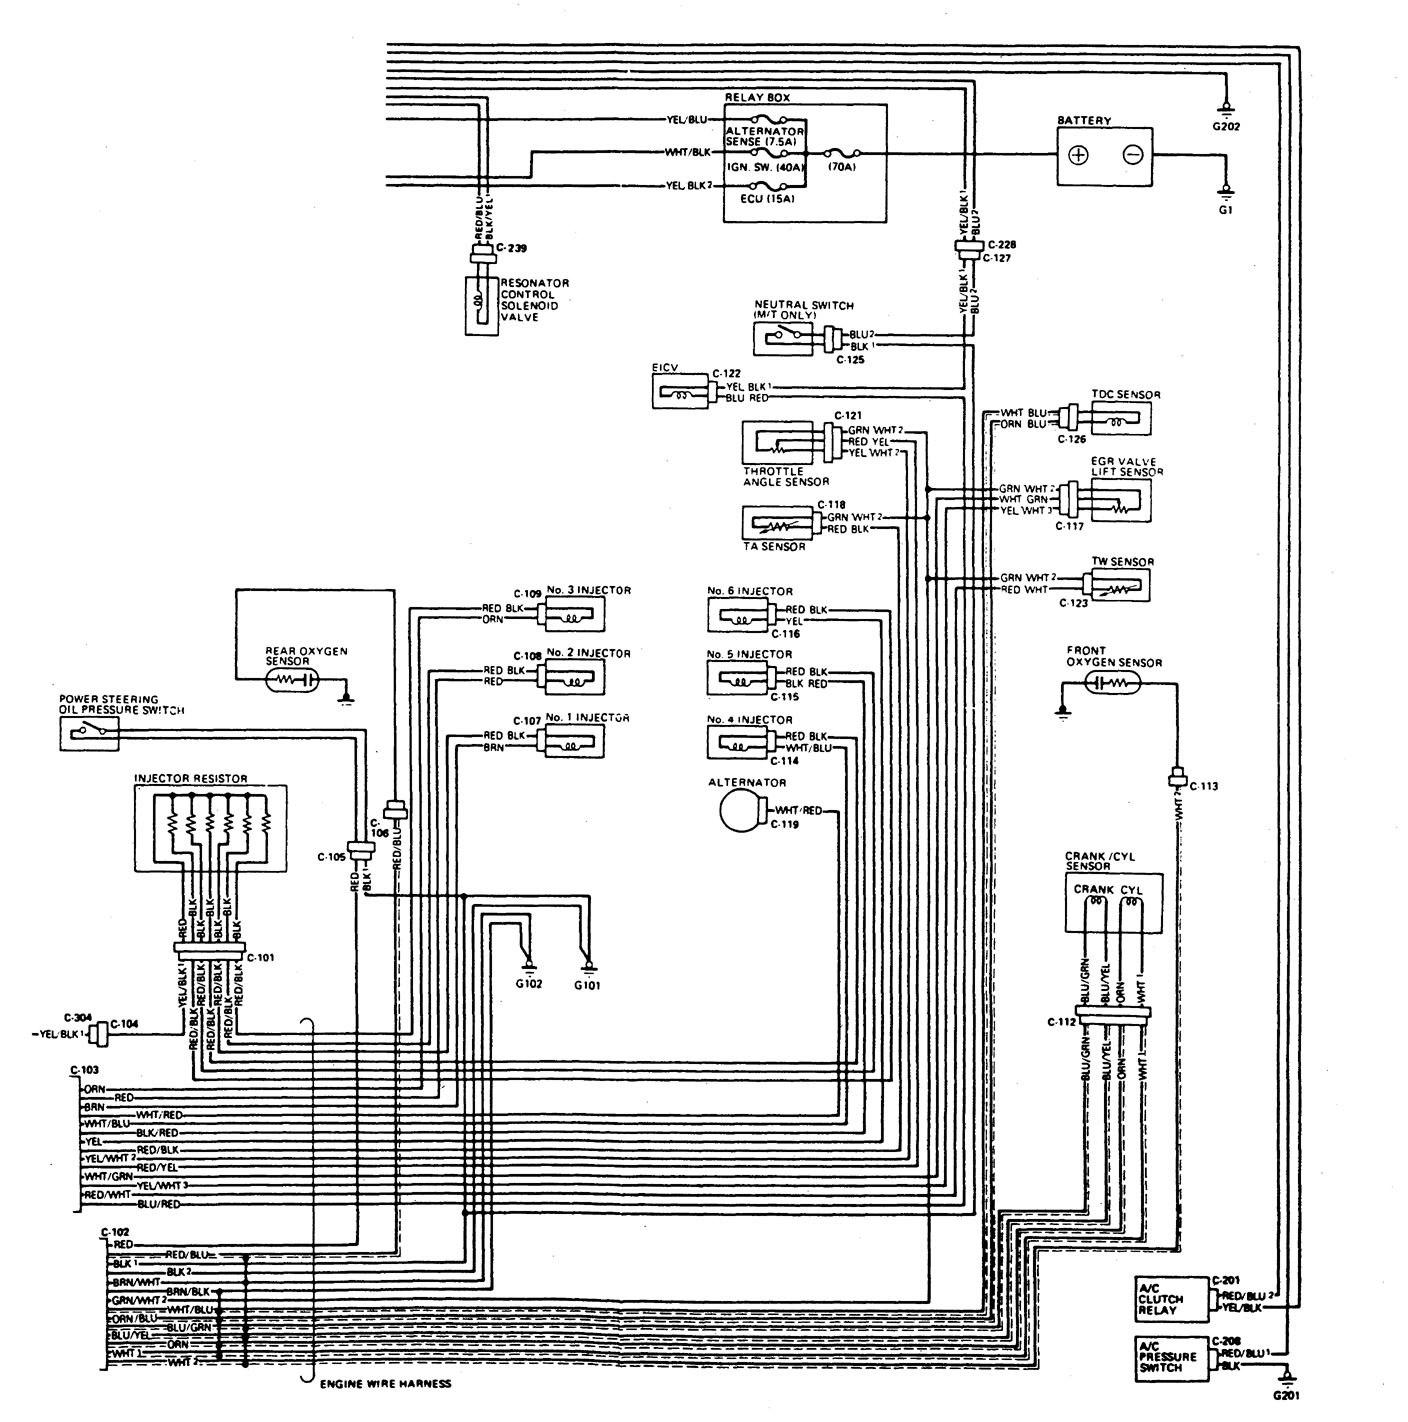 97 ford f150 radio wiring harness